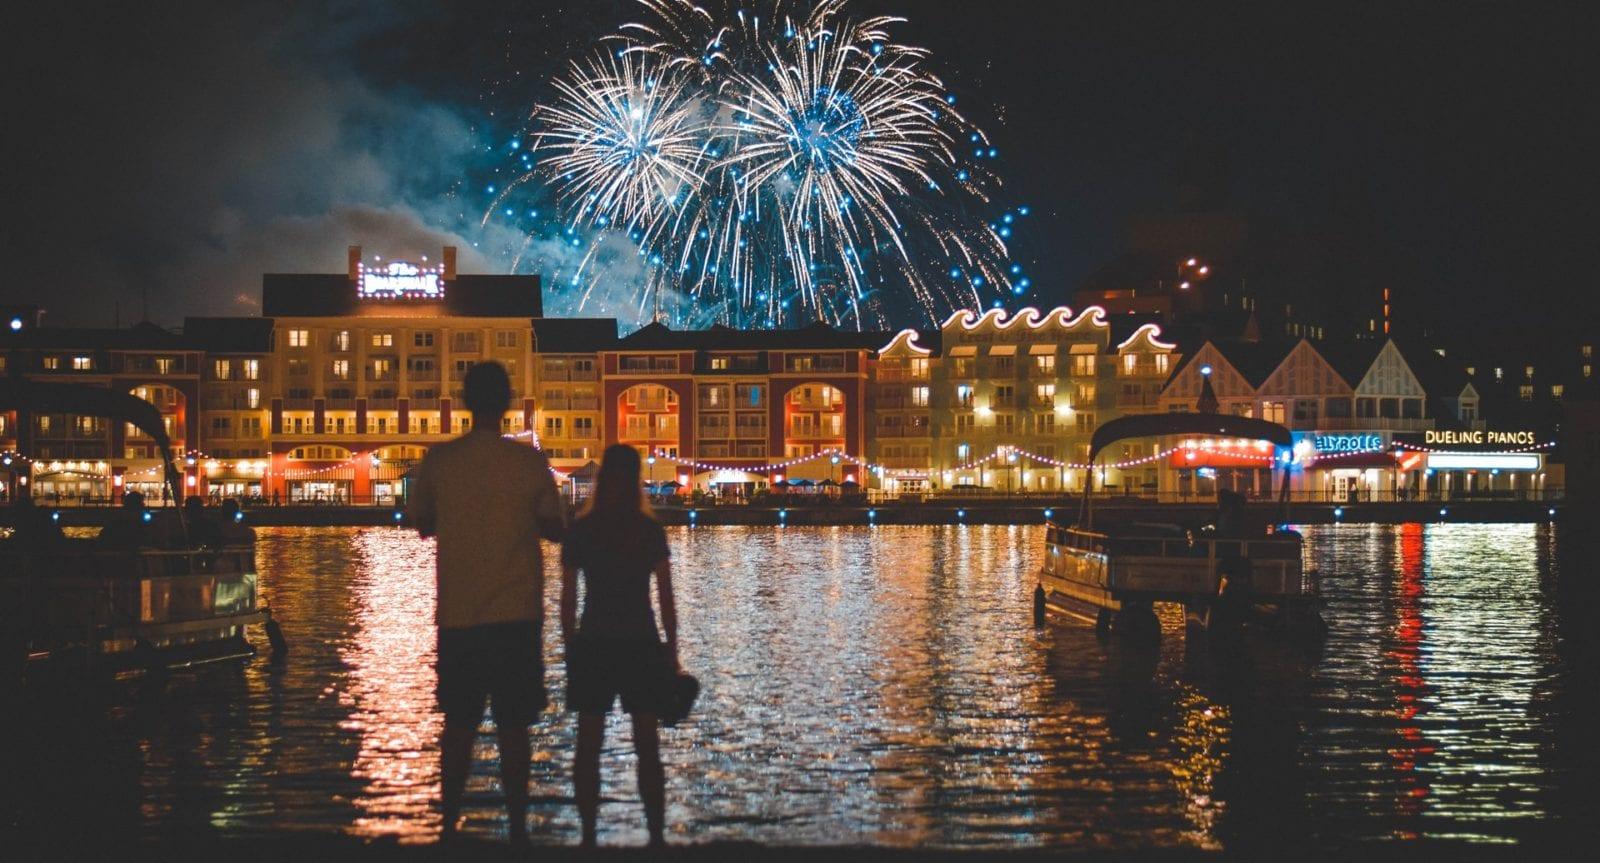 The fireworks show at Disney's Boardwalk Resort near Disney World. (Photo: Matt Popovich on Unsplash)